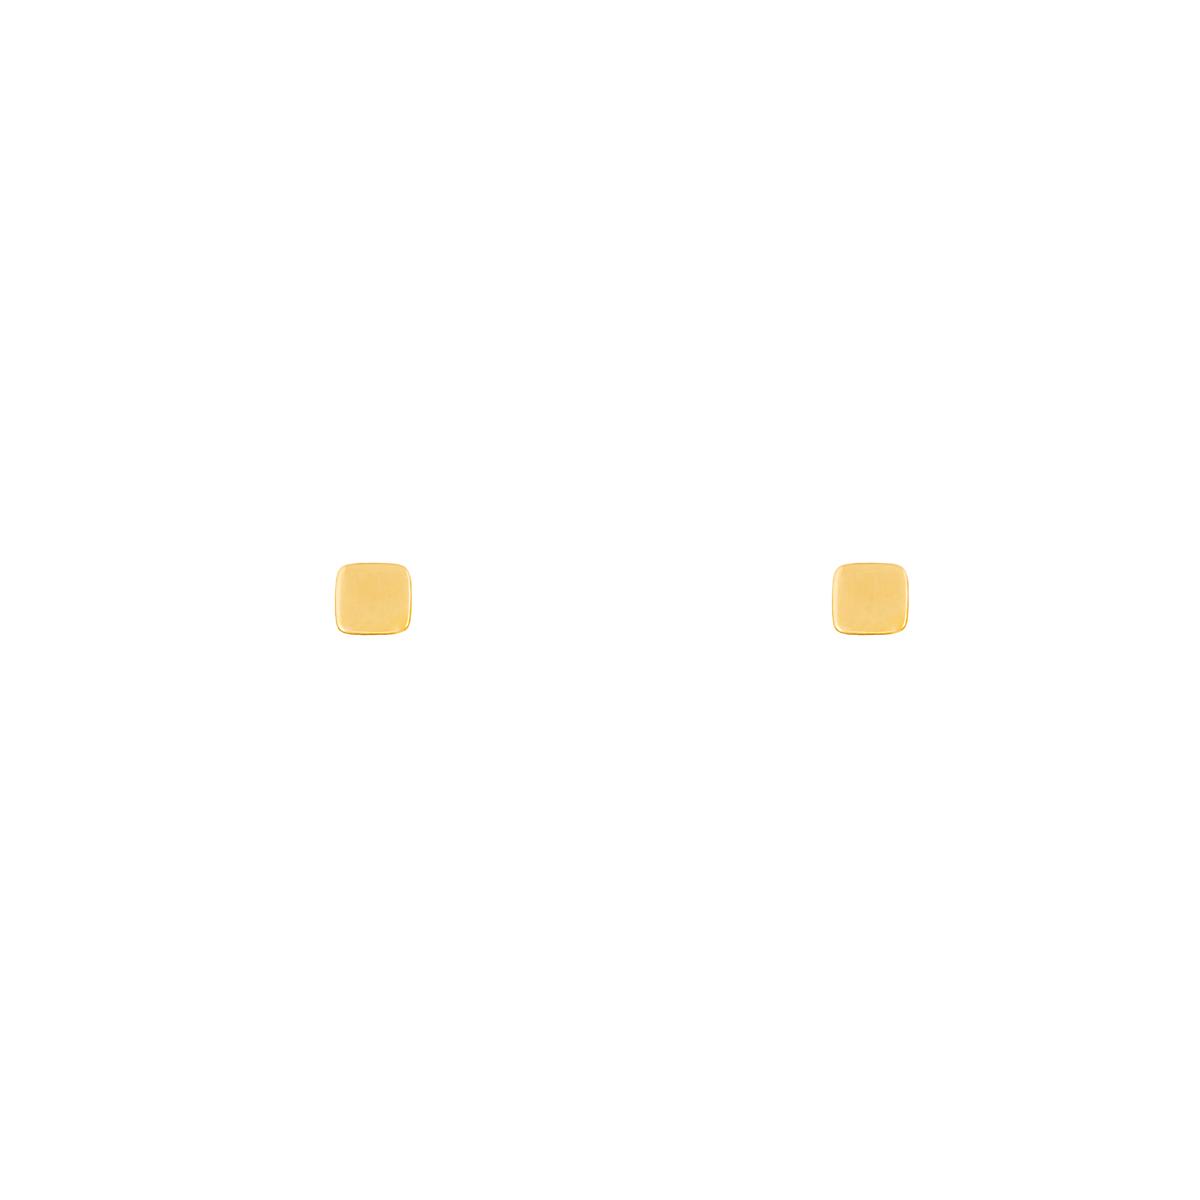 گوشواره طلا مربع بزرگ